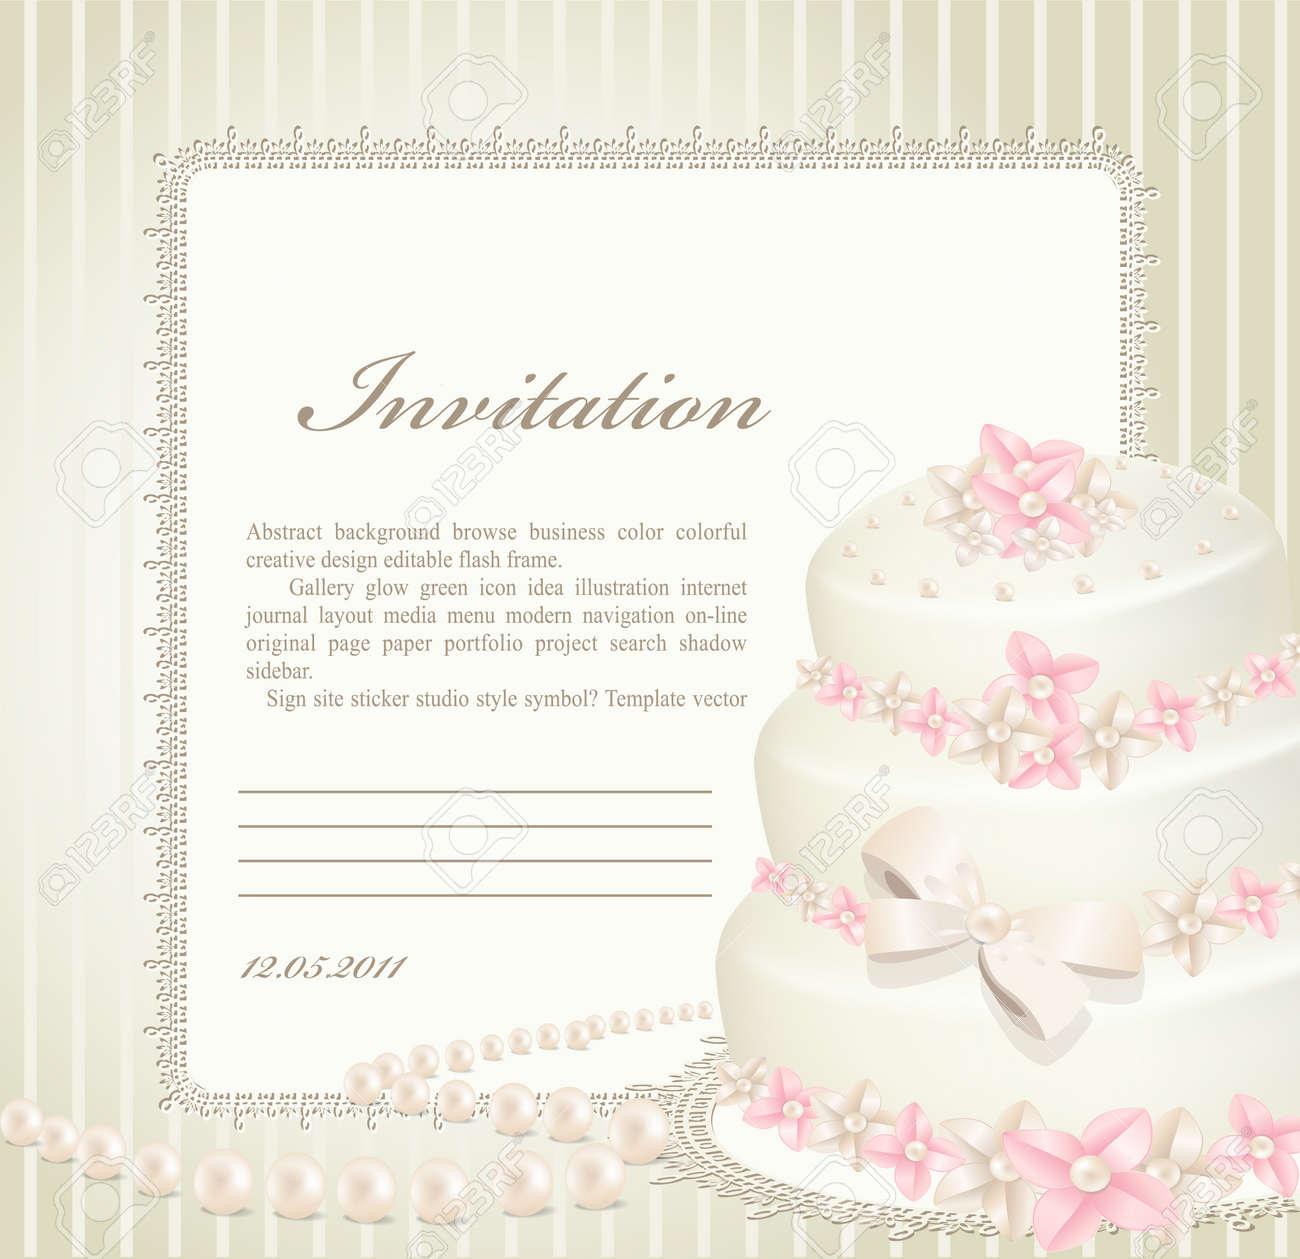 Wedding Invitation, Greeting Card With A Birthday Cake Royalty Free ...